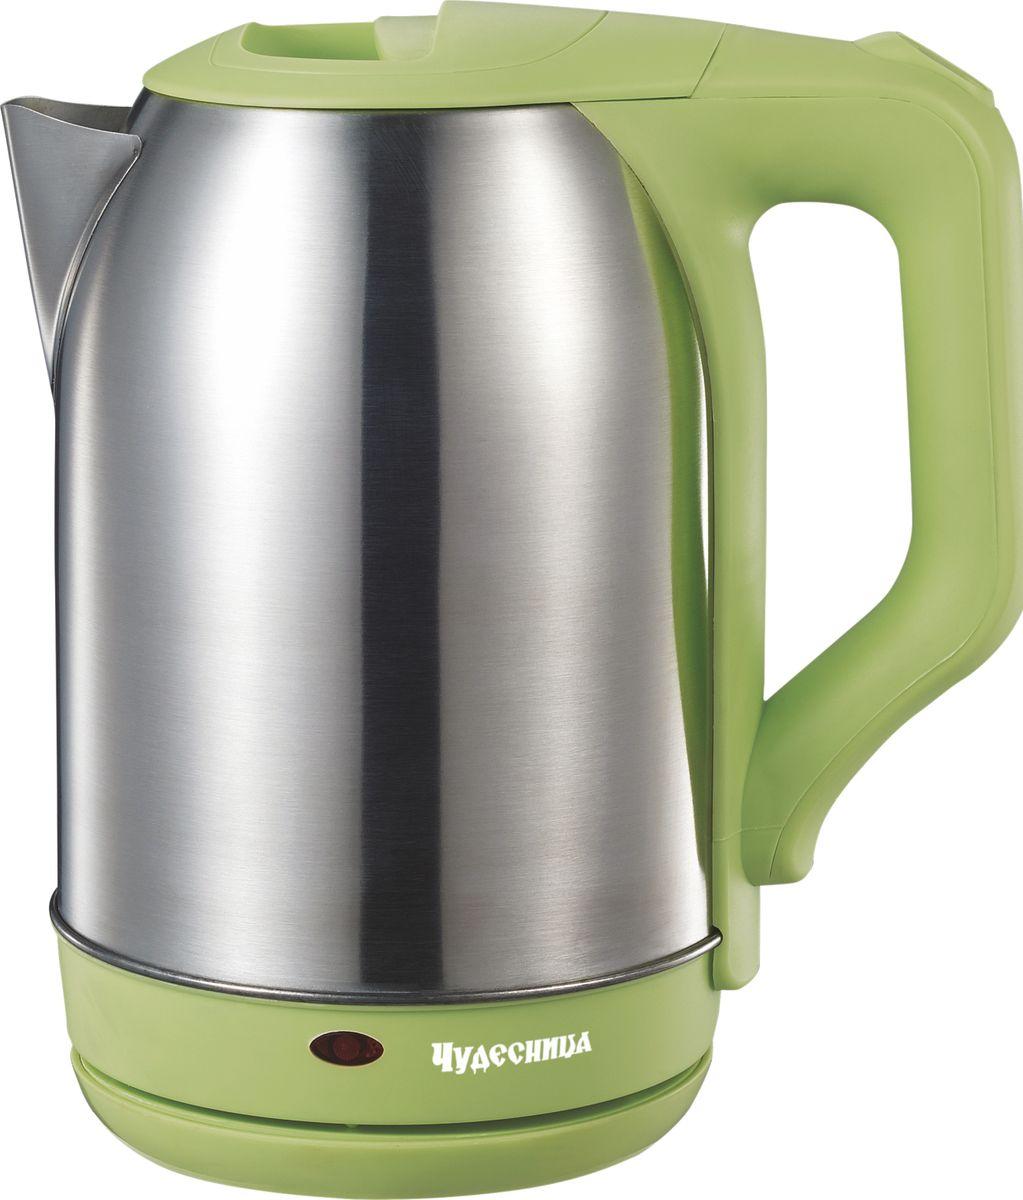 Чудесница ЭЧ-2021, Green чайник электрический цена и фото